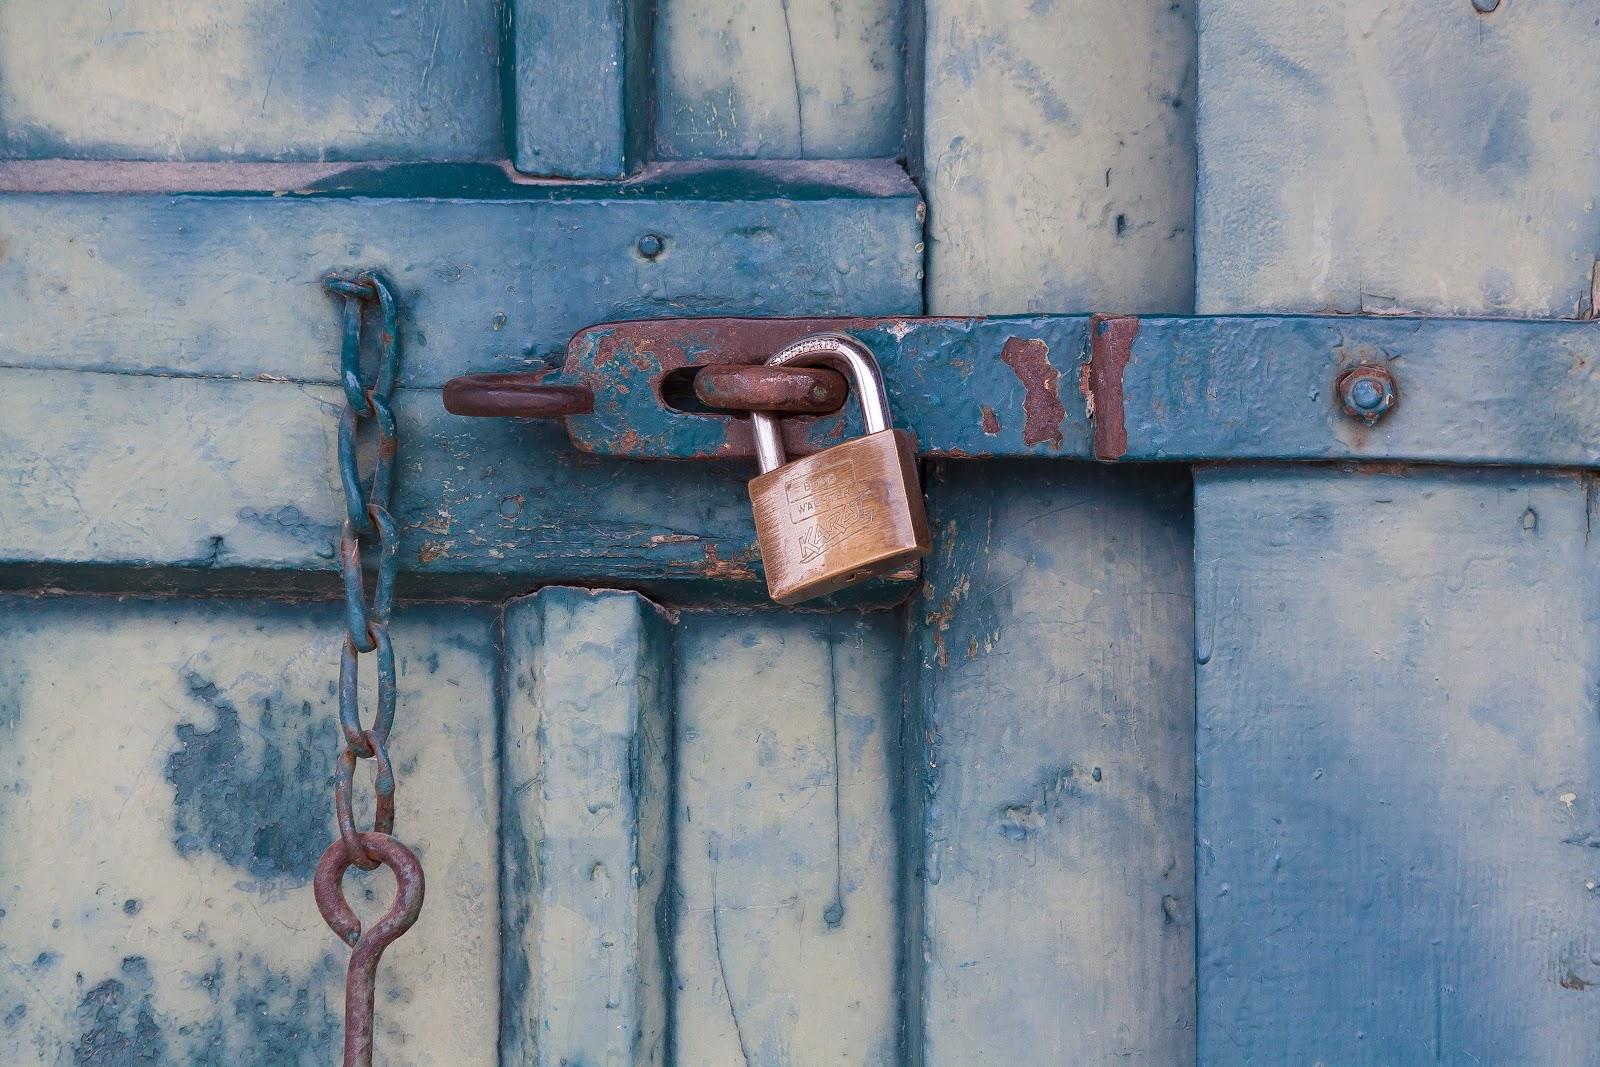 A padlock on a door